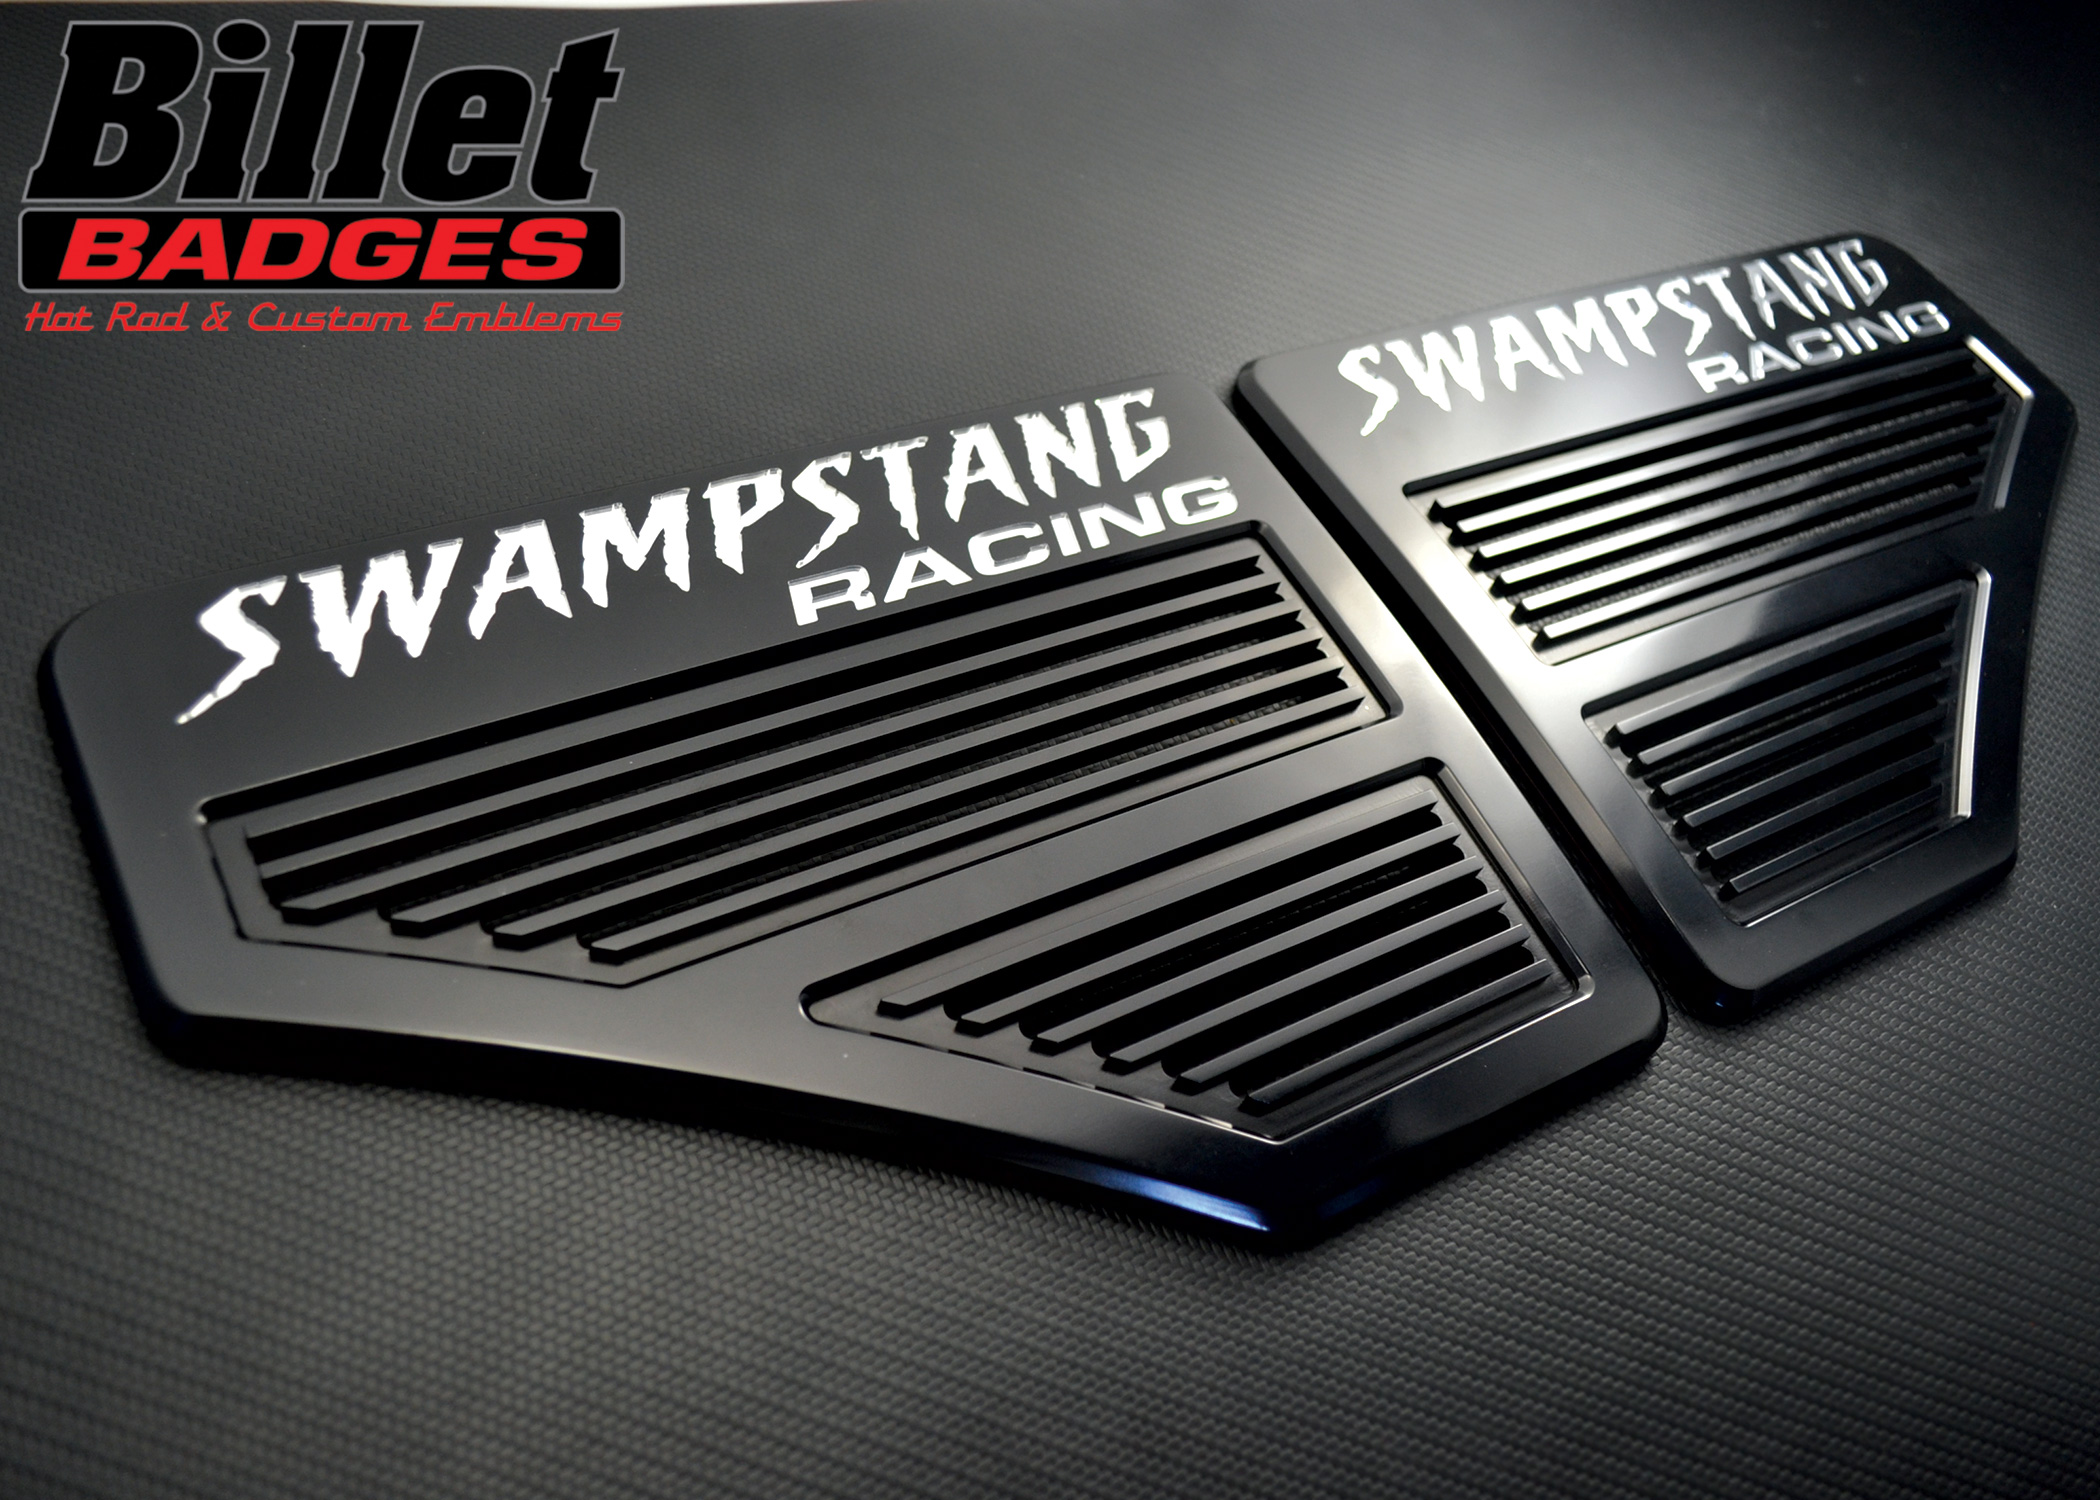 Swampstang Racing